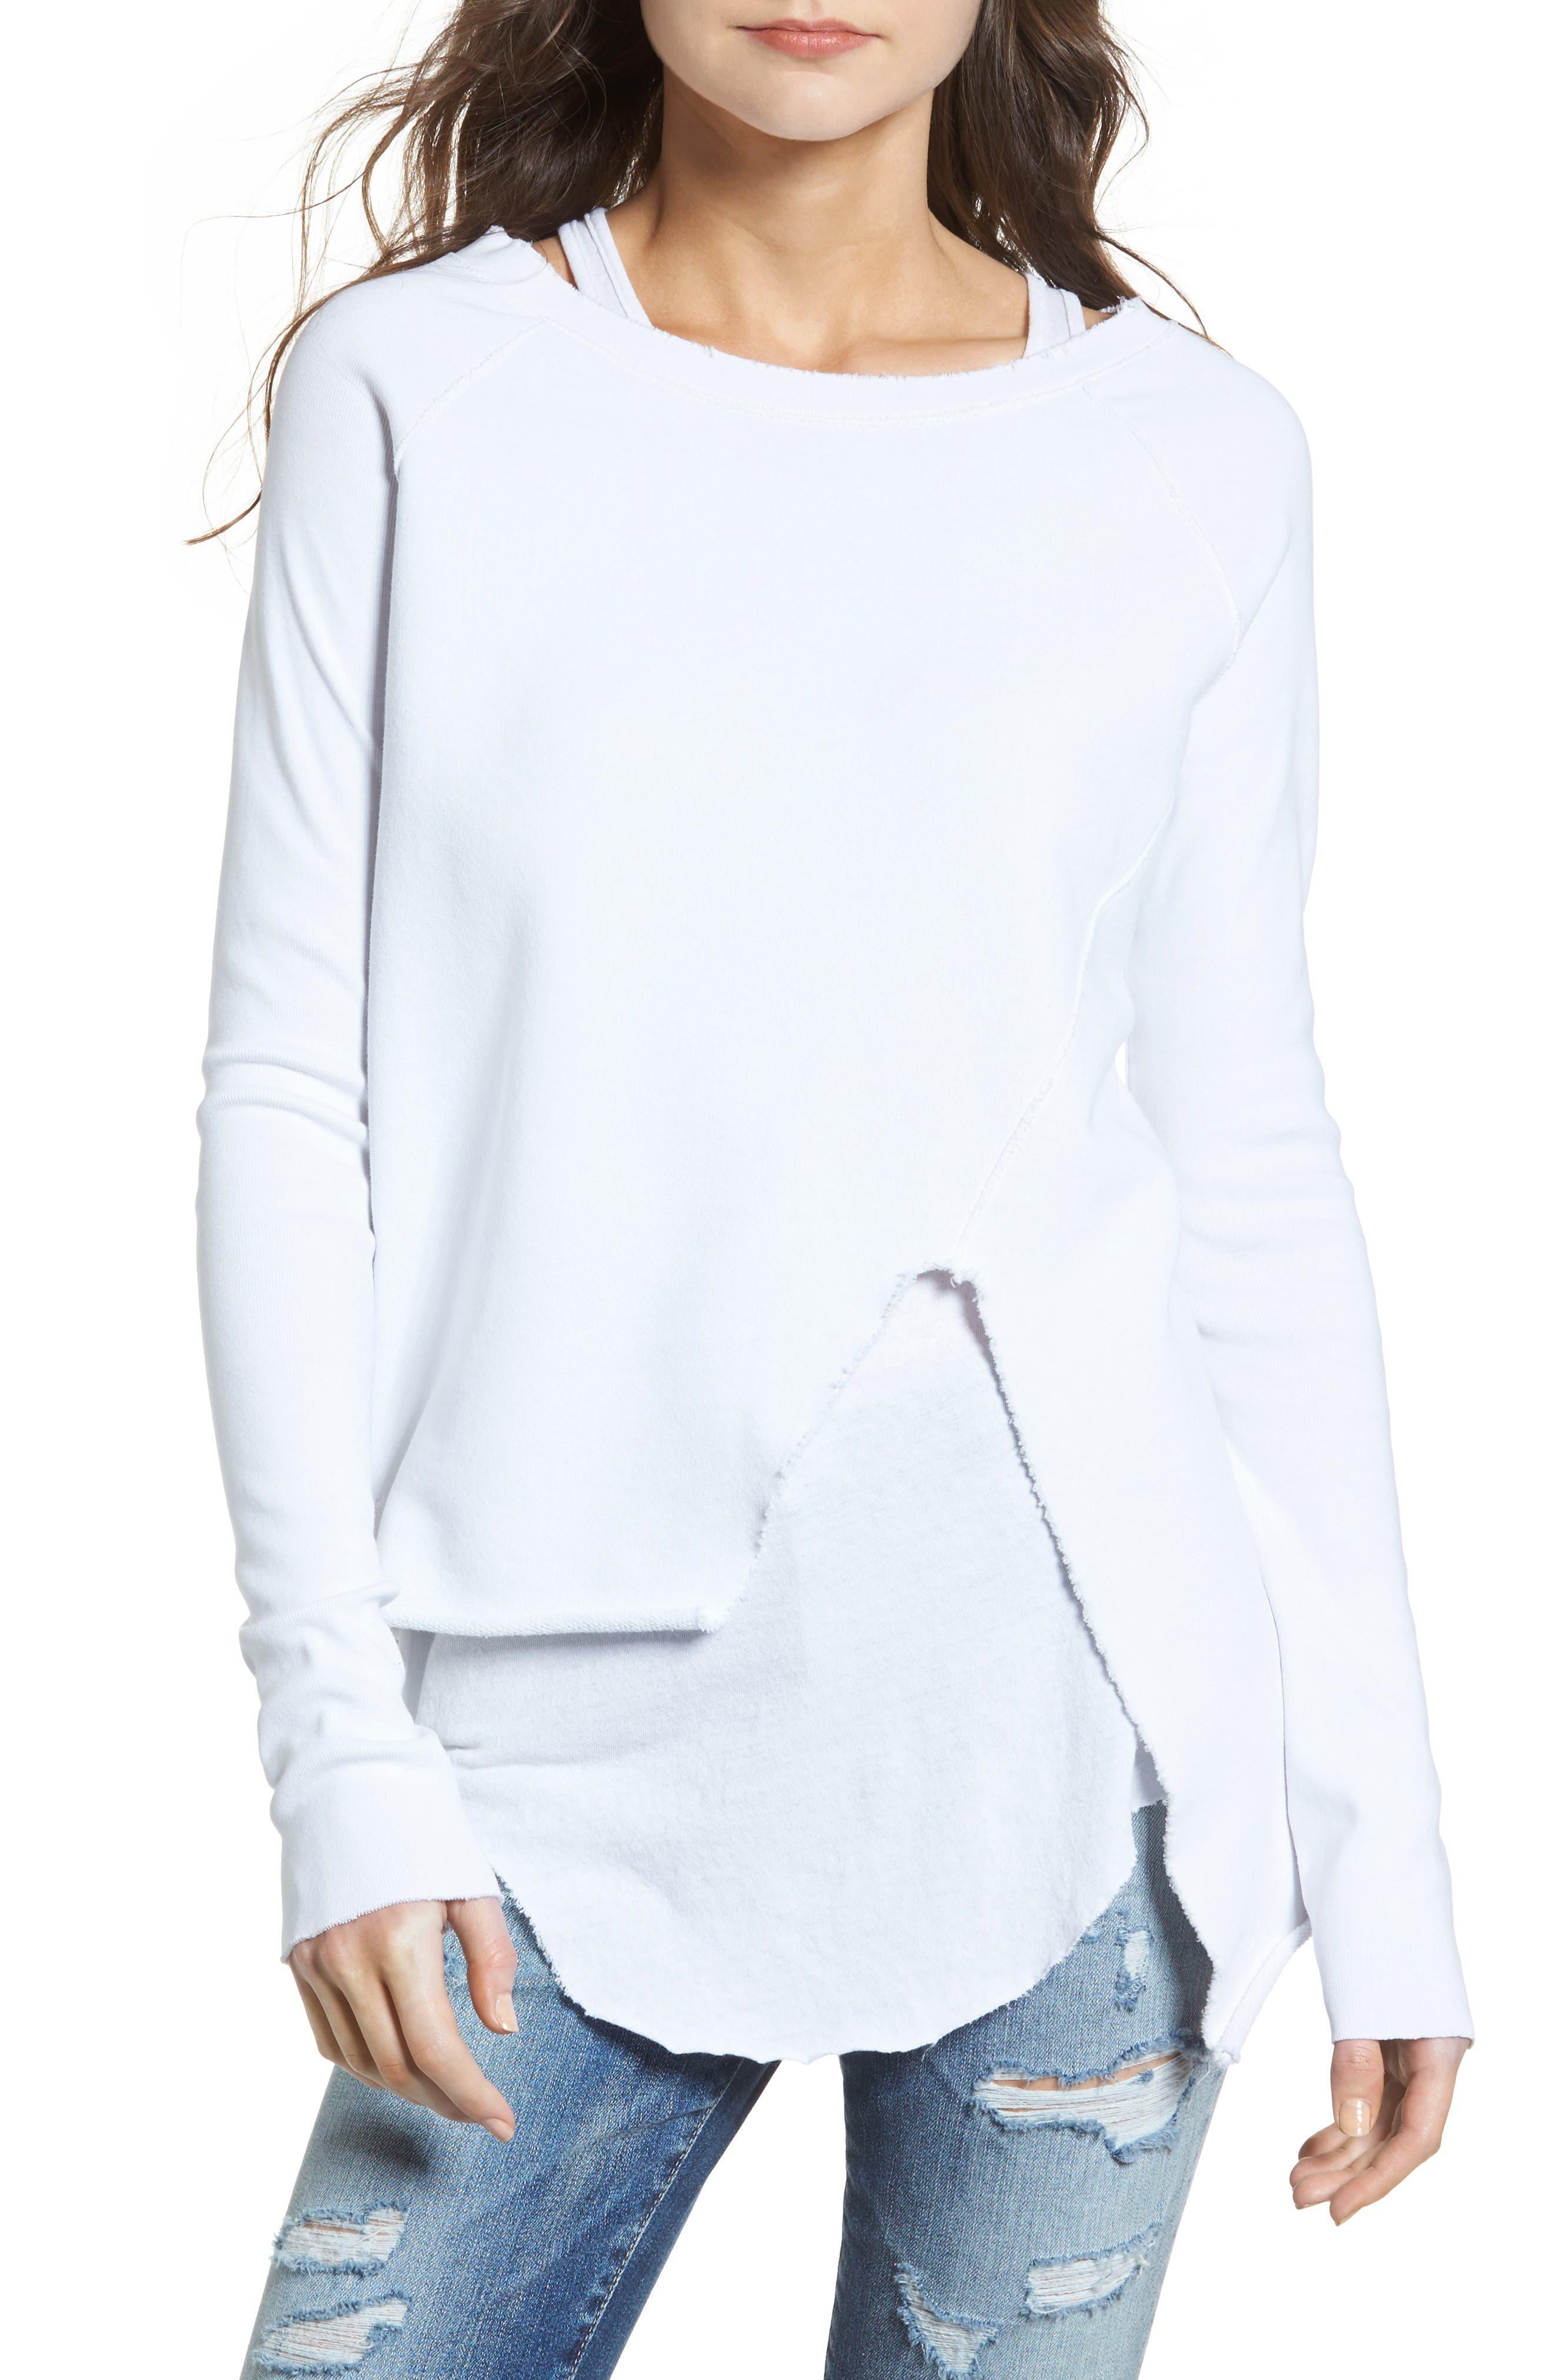 Main Image - Frank & Eileen Tee Lab Asymmetrical Sweatshirt